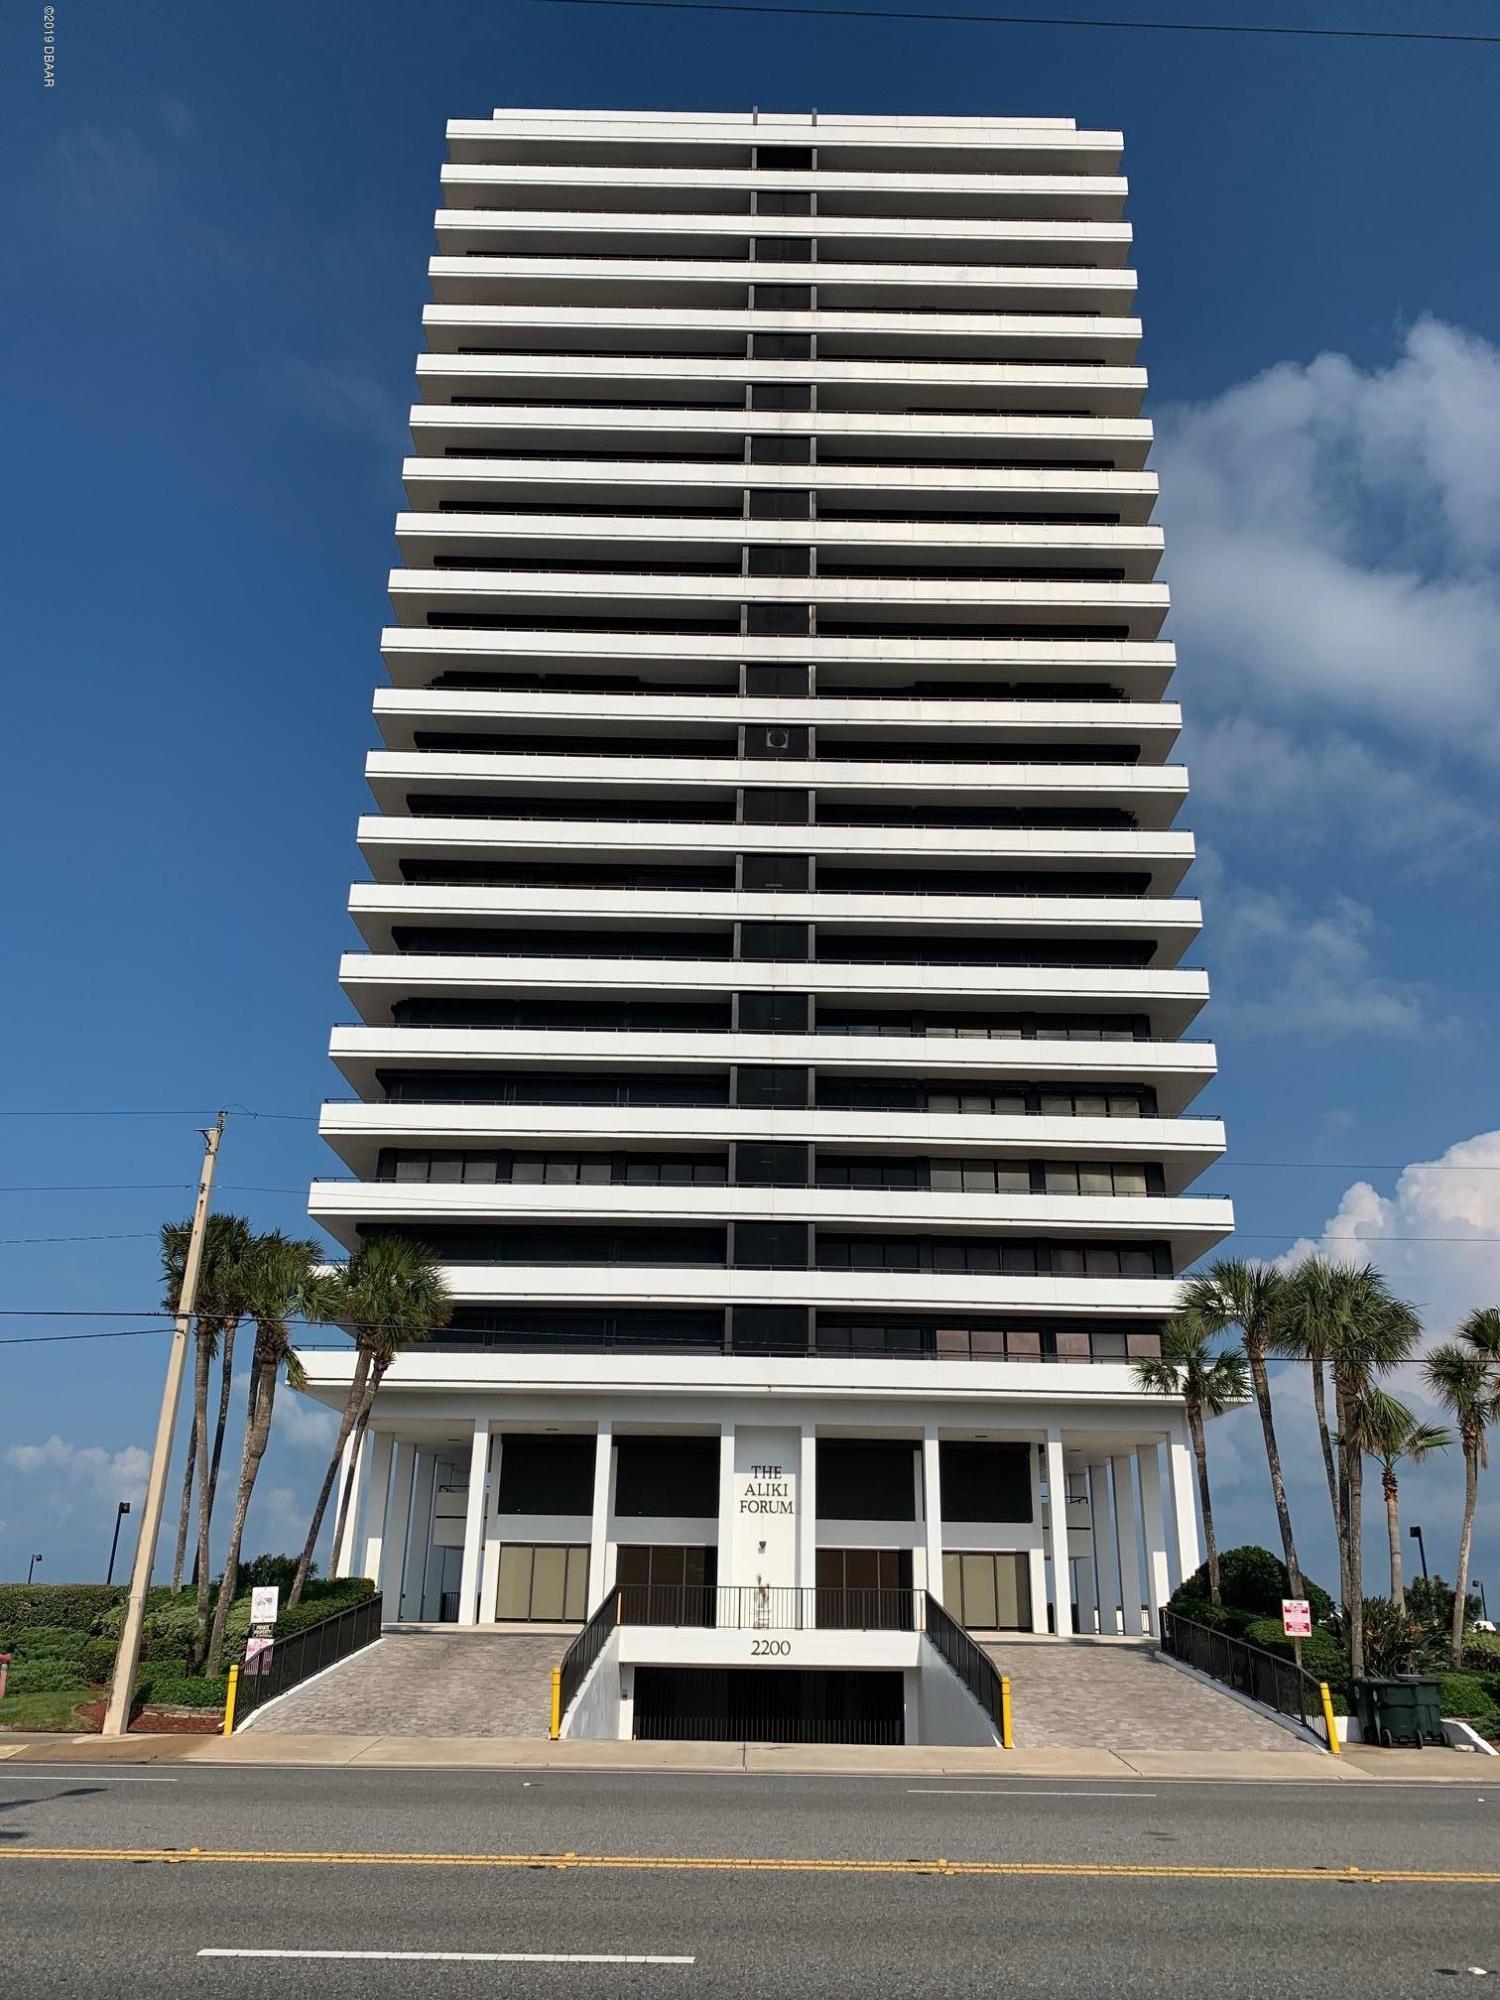 2200 N Atlantic Avenue, Daytona Beach Shores, Florida